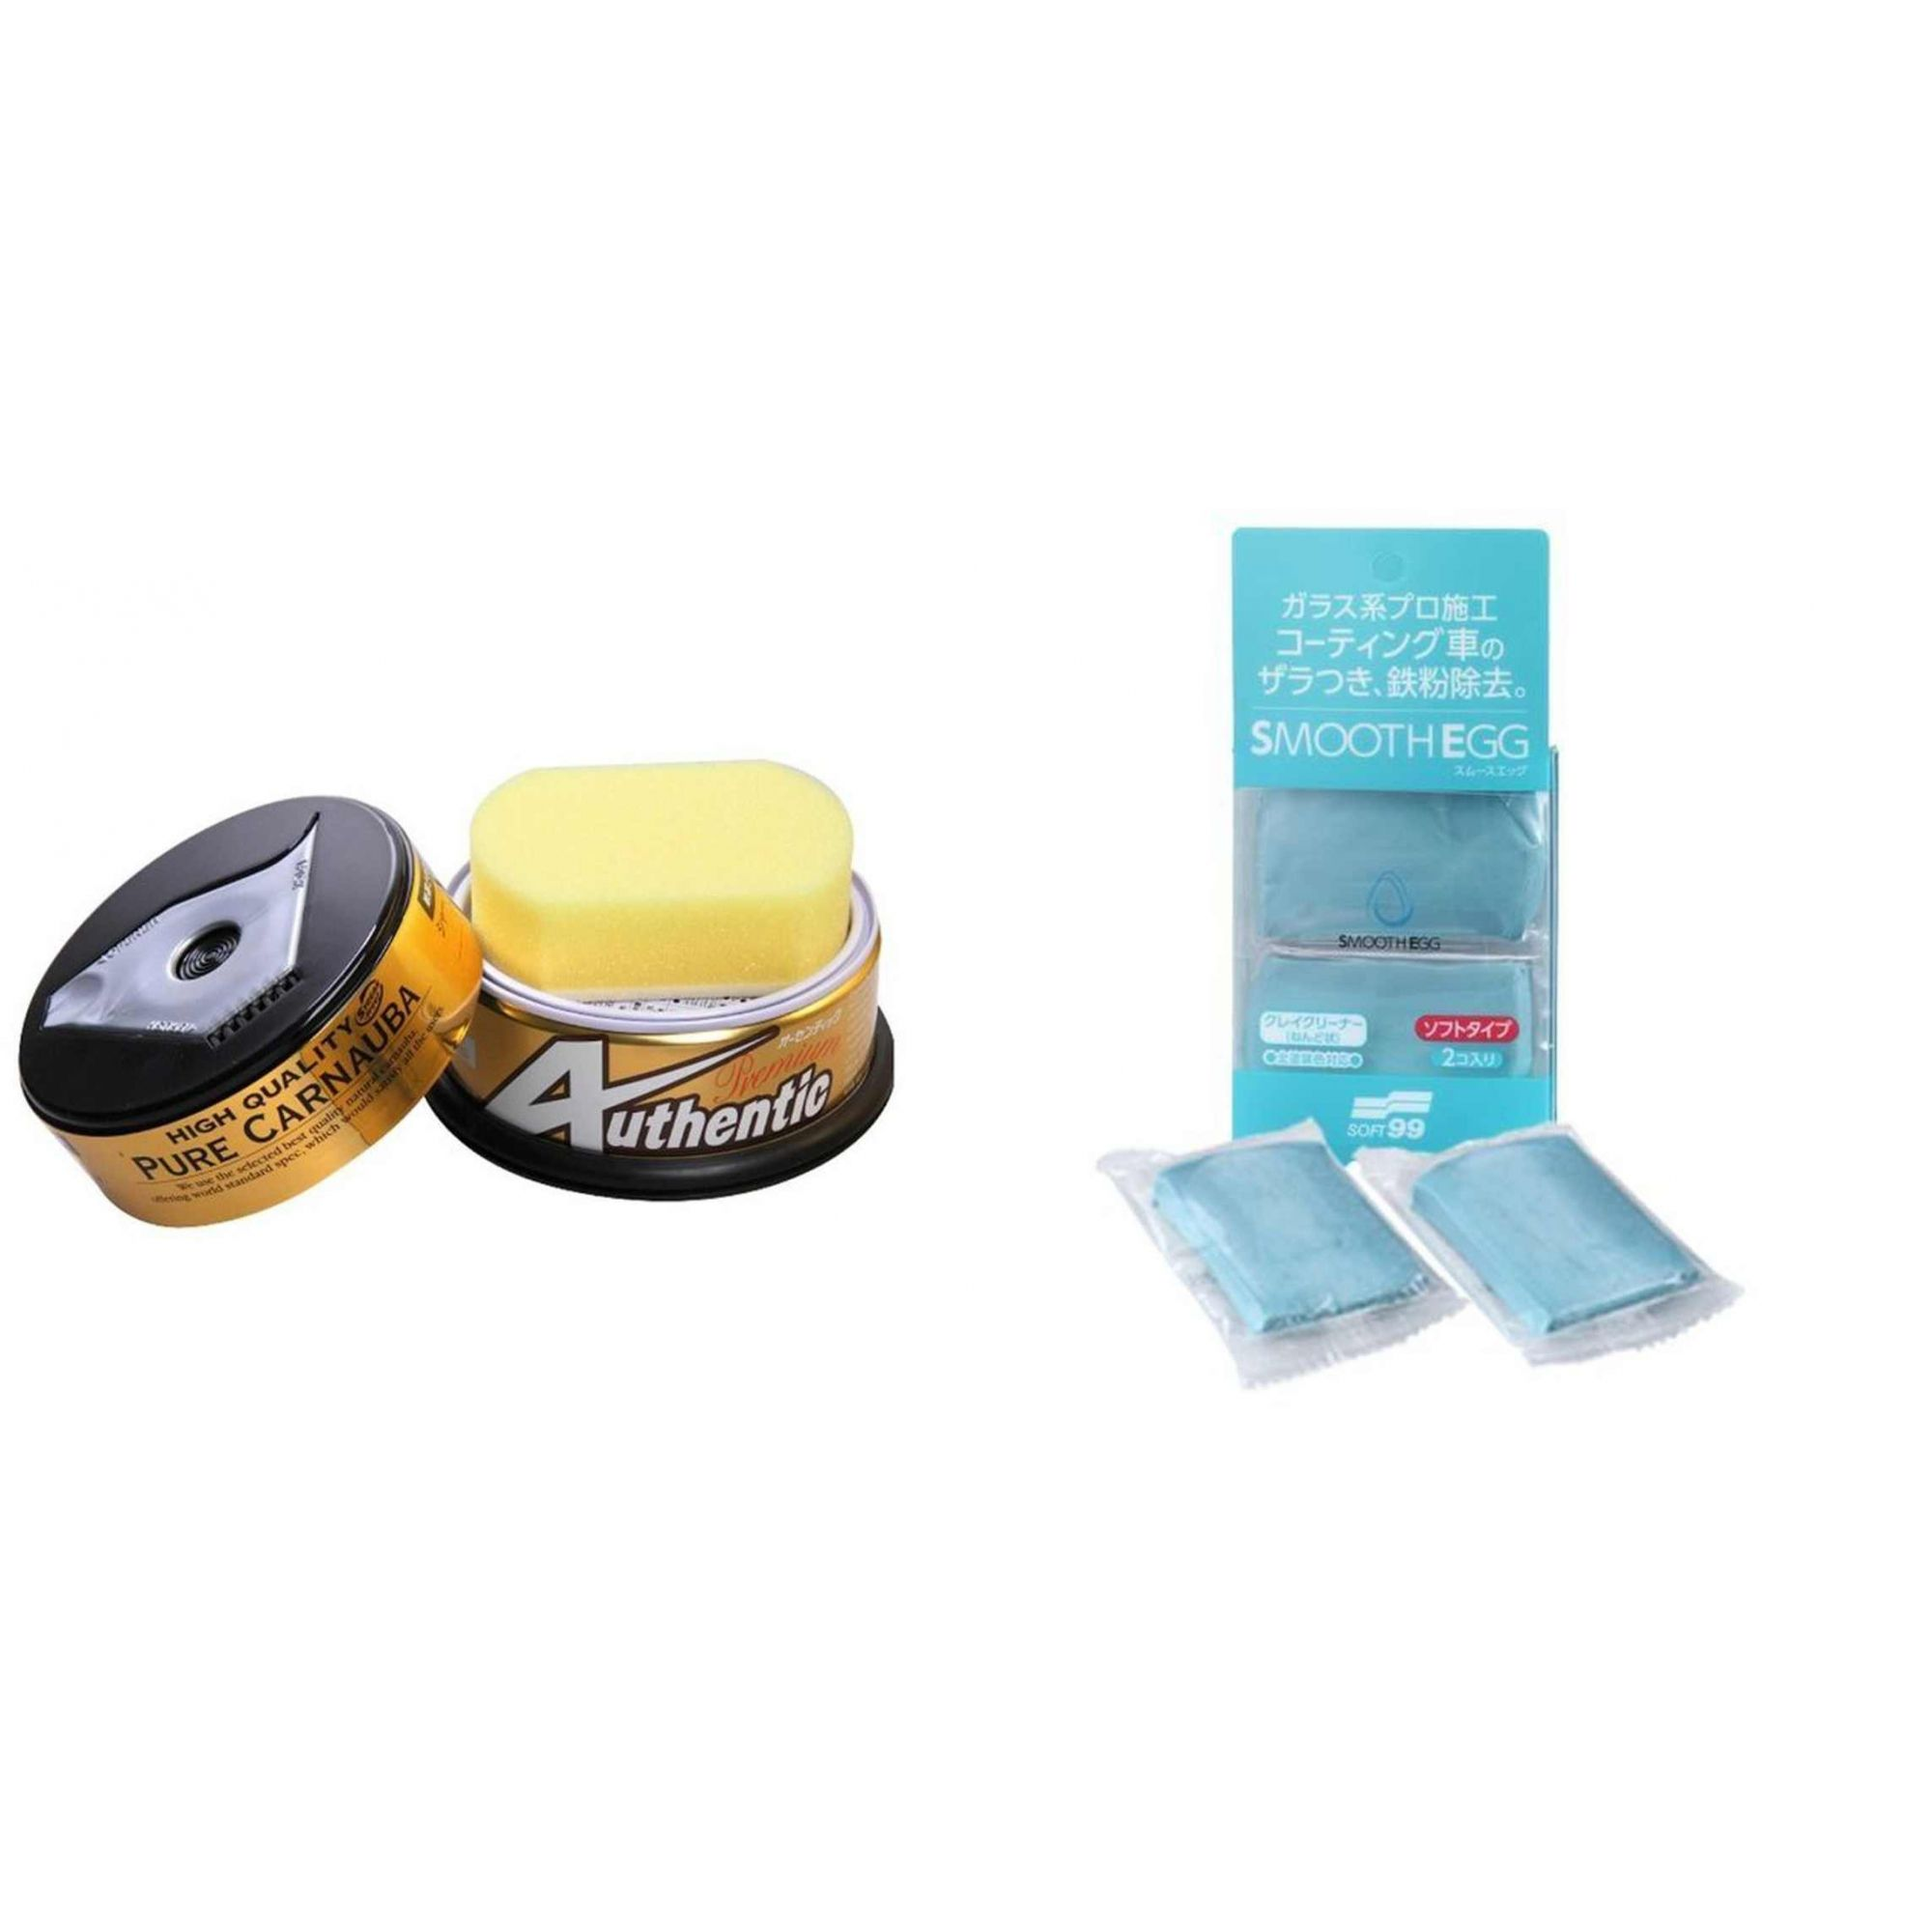 1un Cera New Authentic Premium Soft99 + Clay Bar Soft99